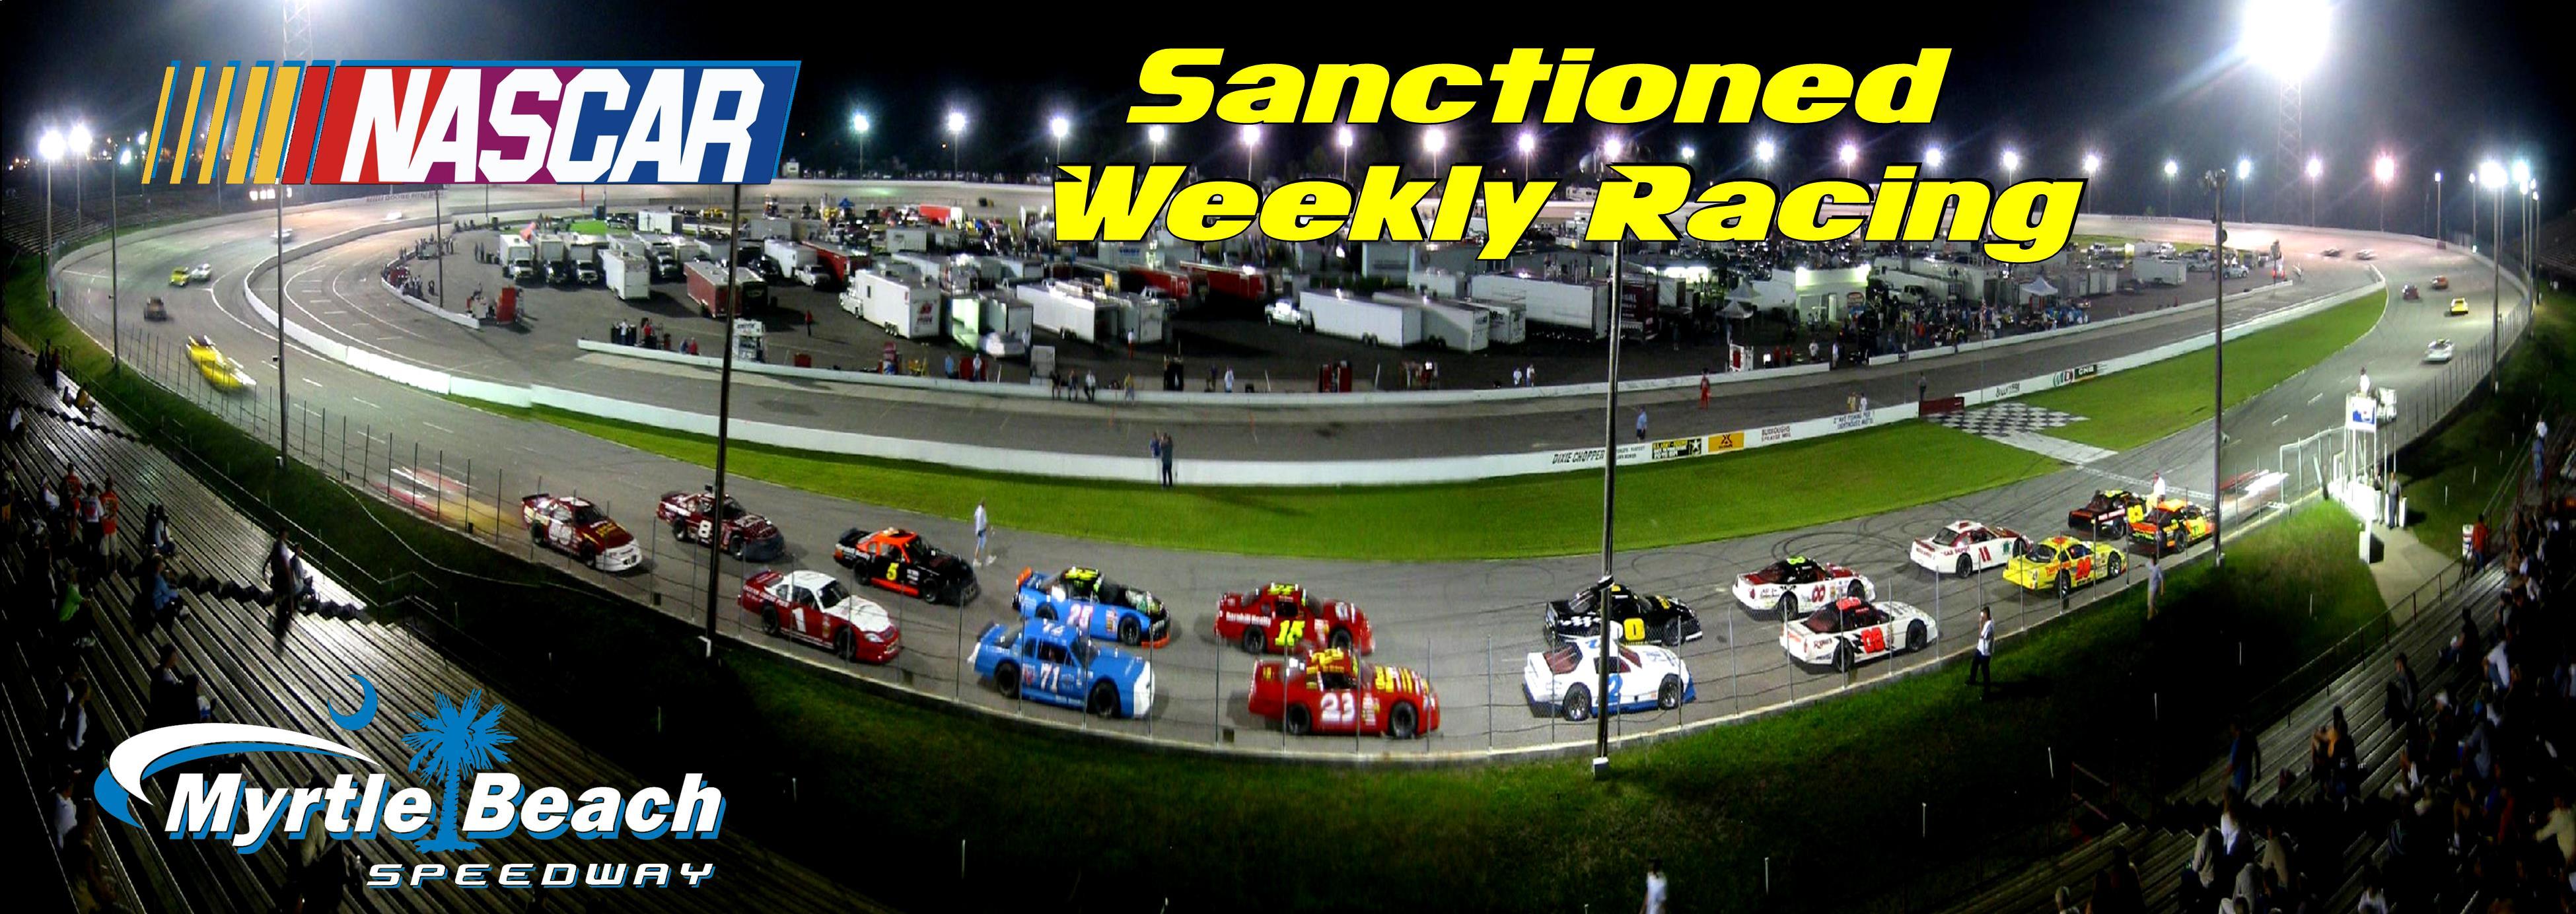 Nascar racing myrtle beach sc weekly racing nascar racing for Texas motor speedway driving experience